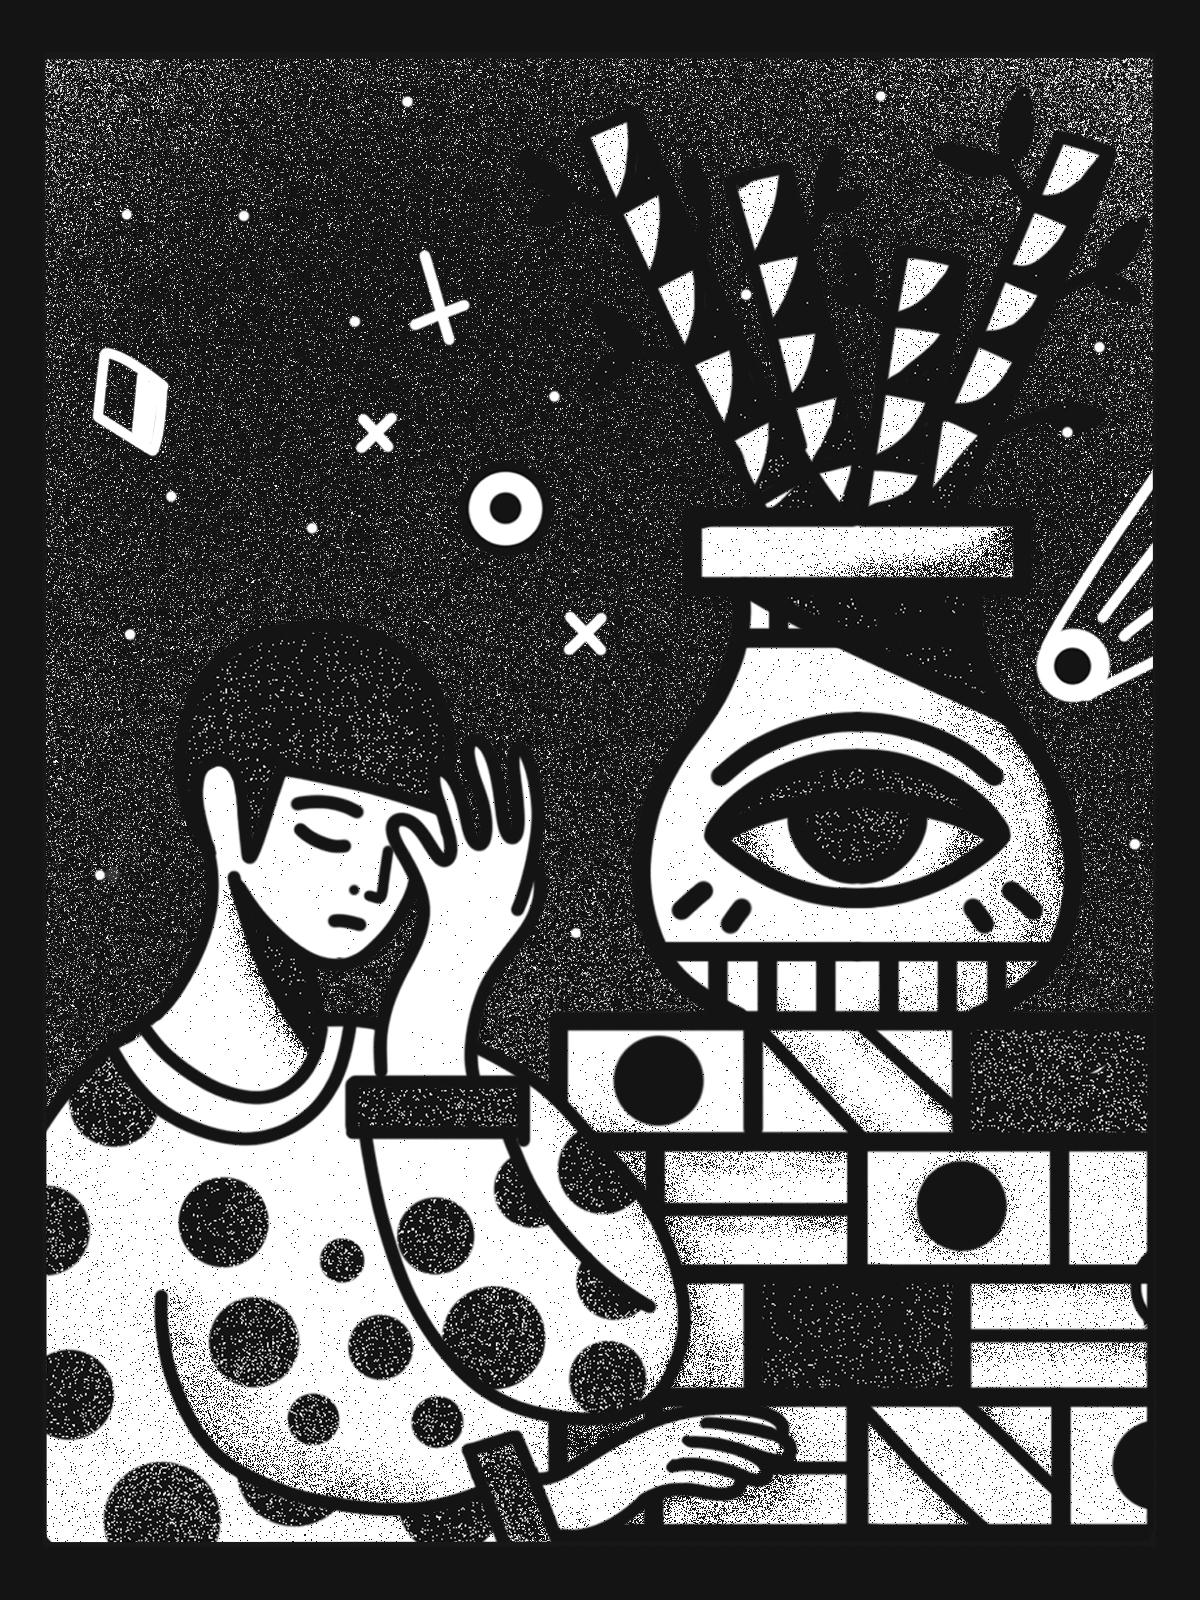 Insomnia Stuck Windows Life - illustration - kzhz | ello